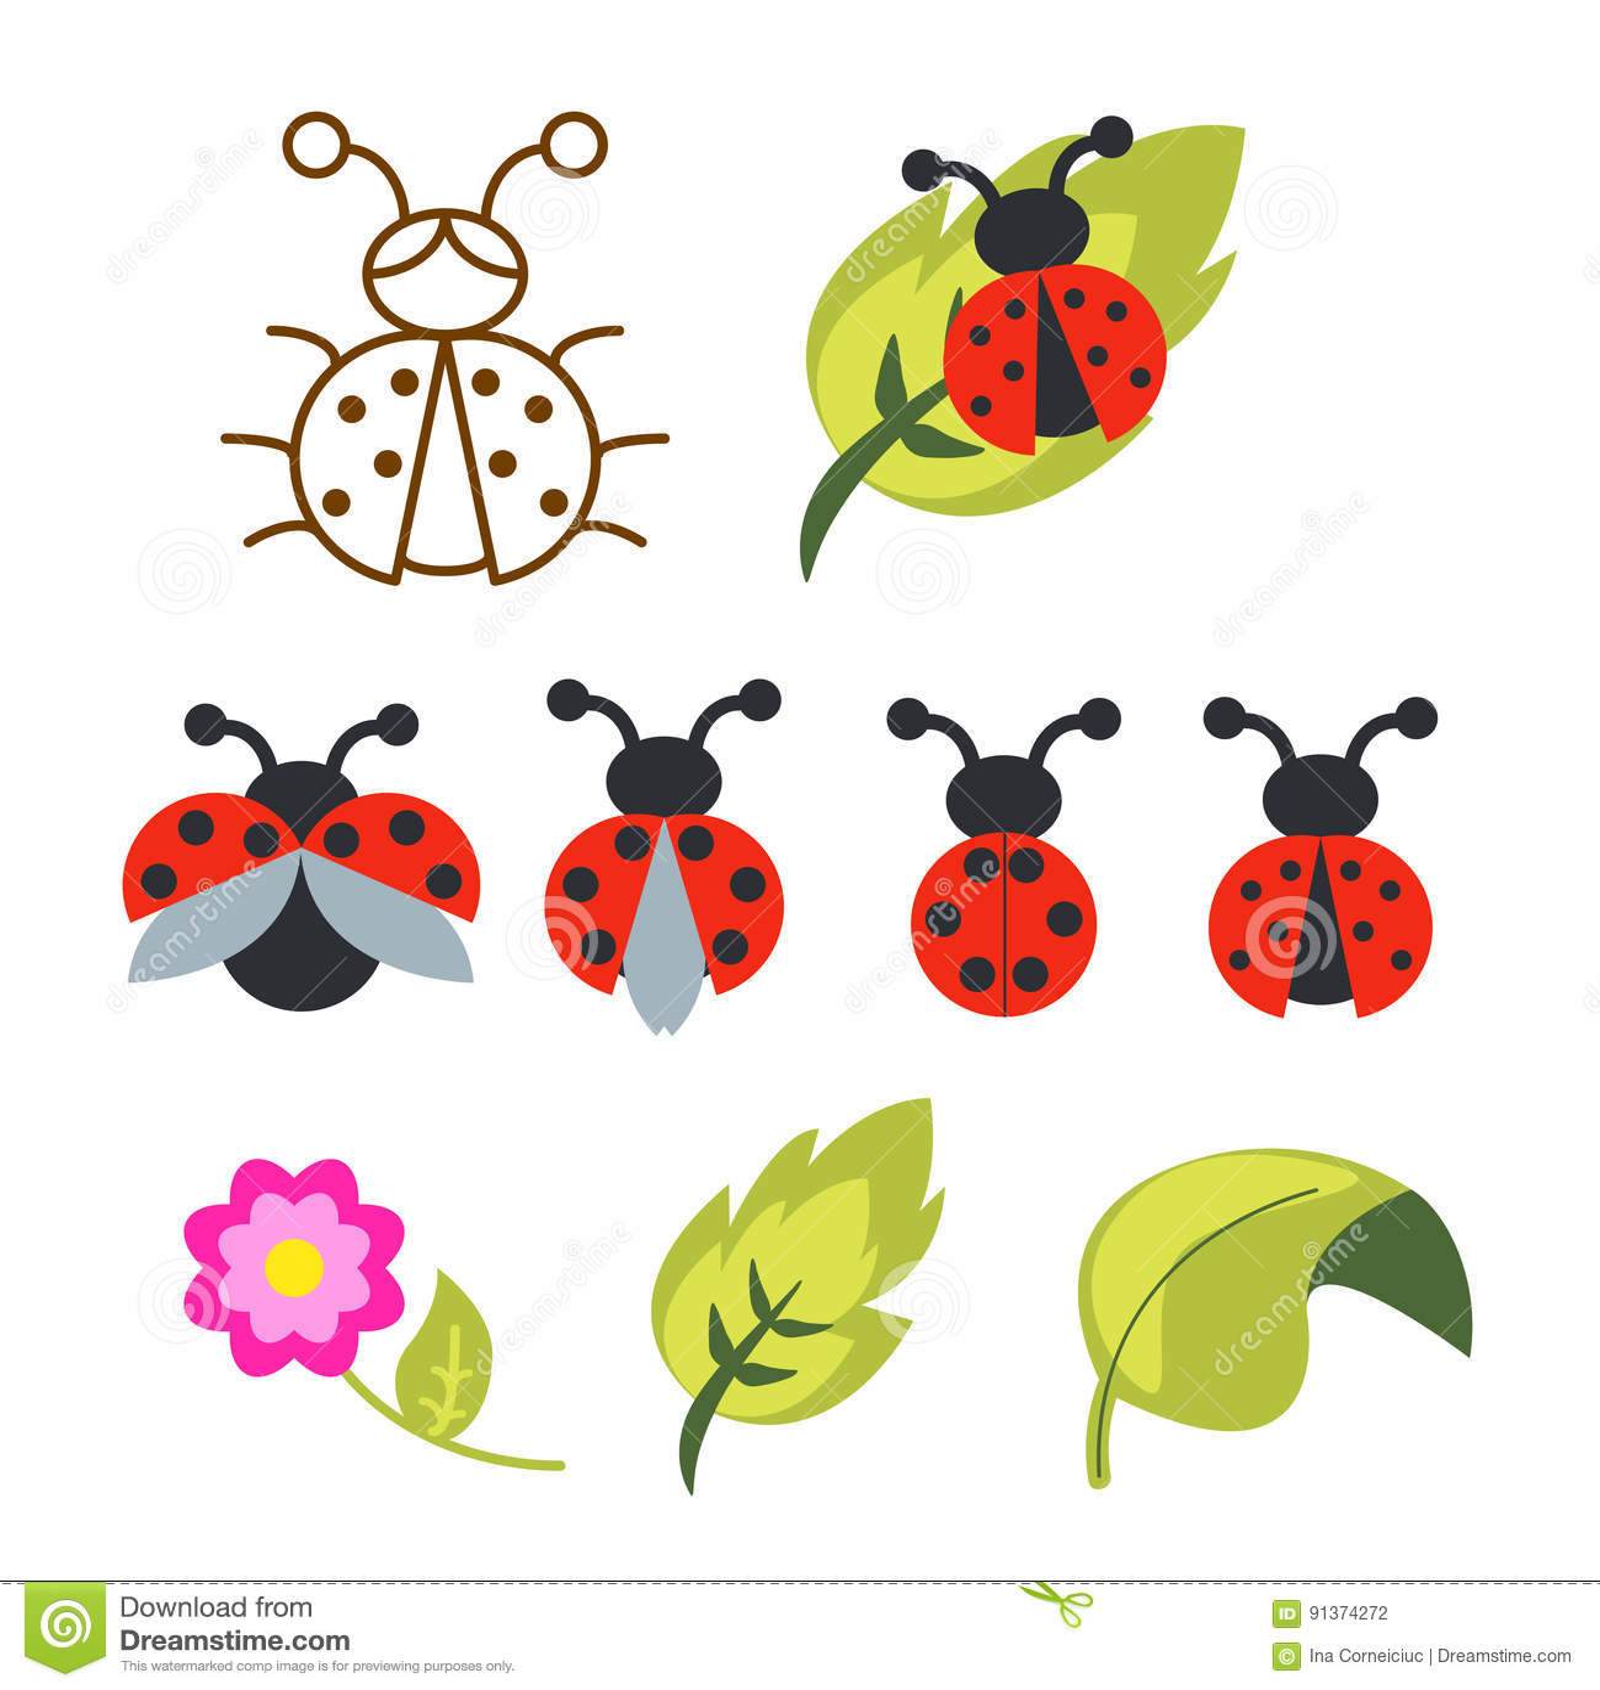 green ladybug clipart - photo #12